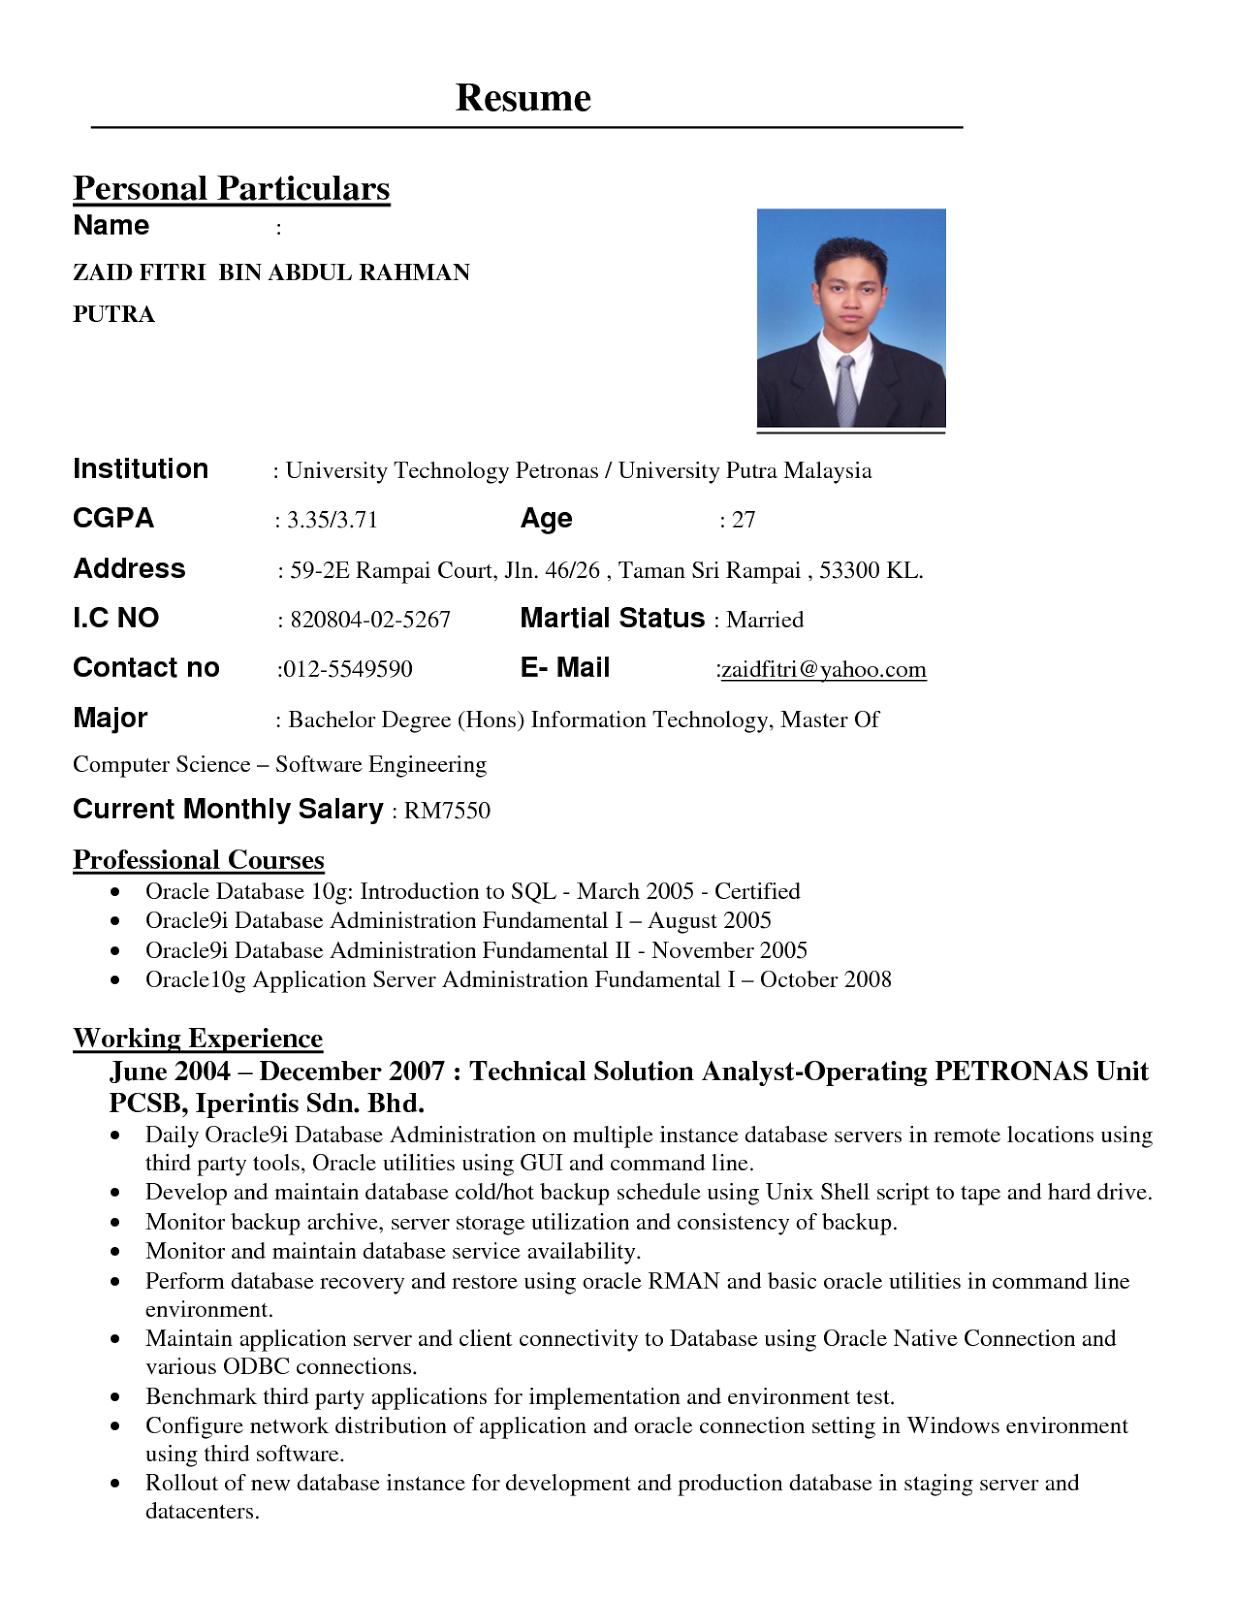 contoh resume kerajaan gontoh